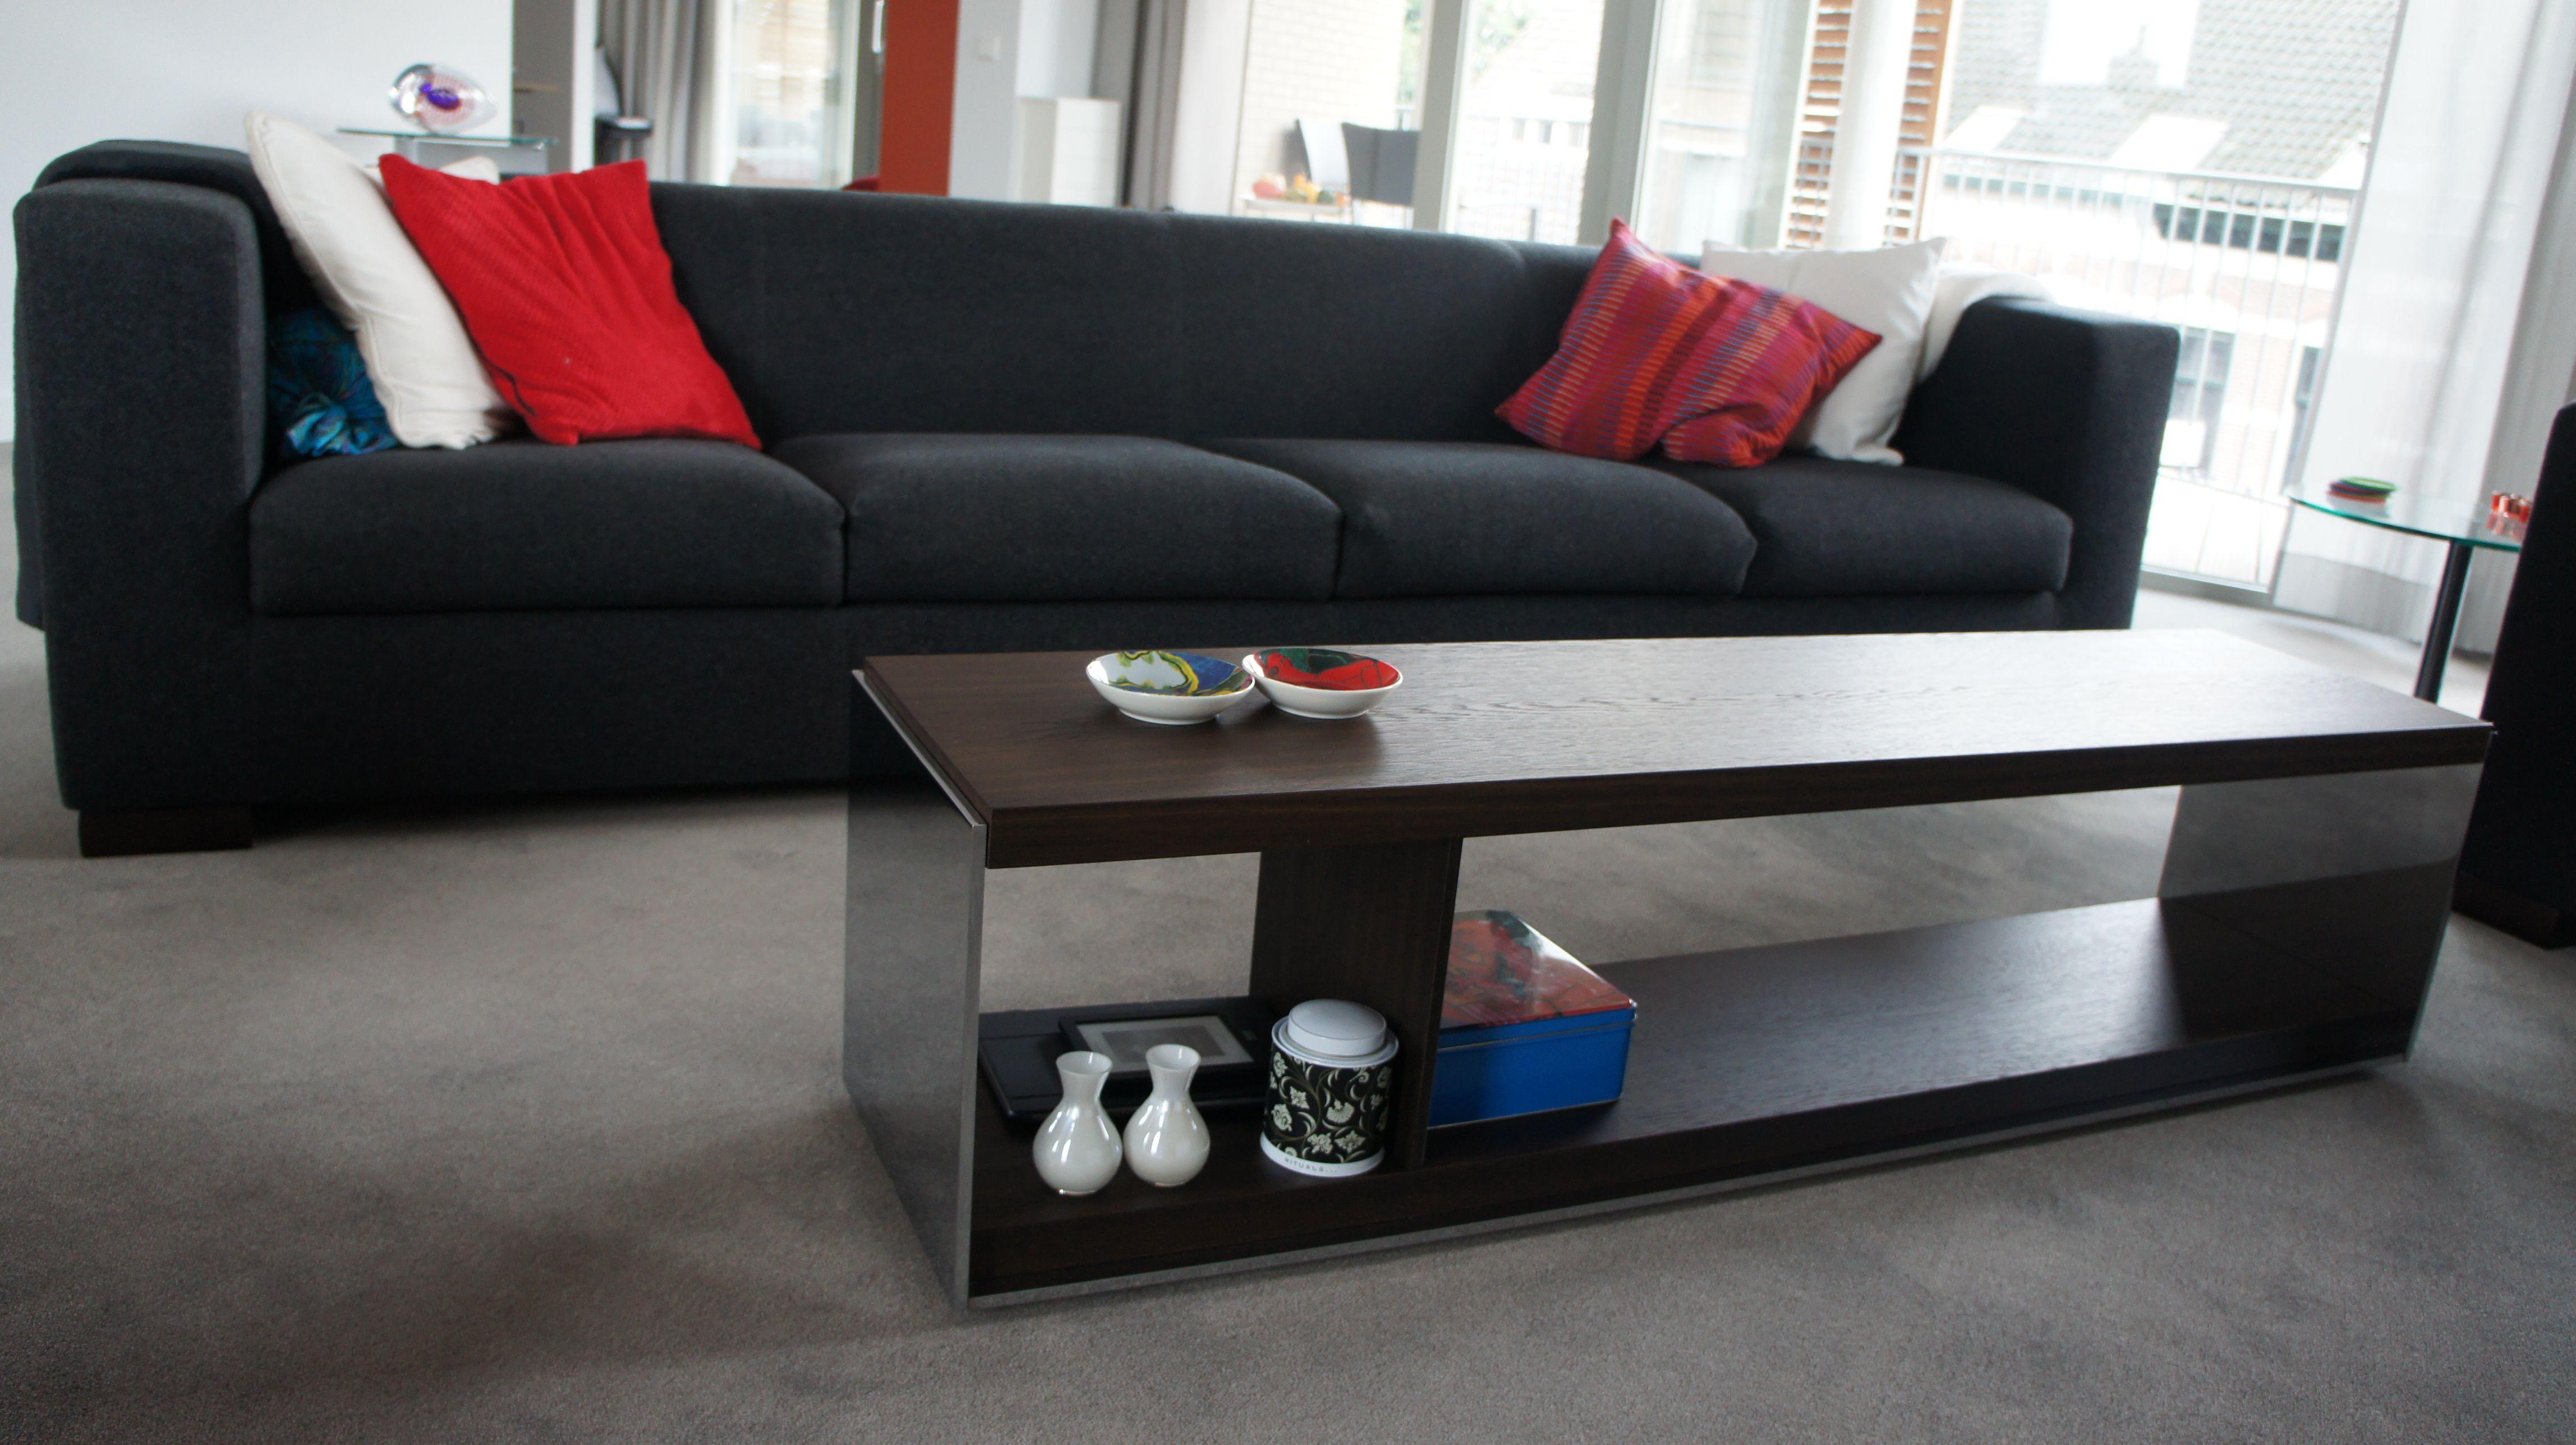 Tapijt In Woonkamer : Woonkamer tapijt top goed woonkamer tapijt luxe bank style amp